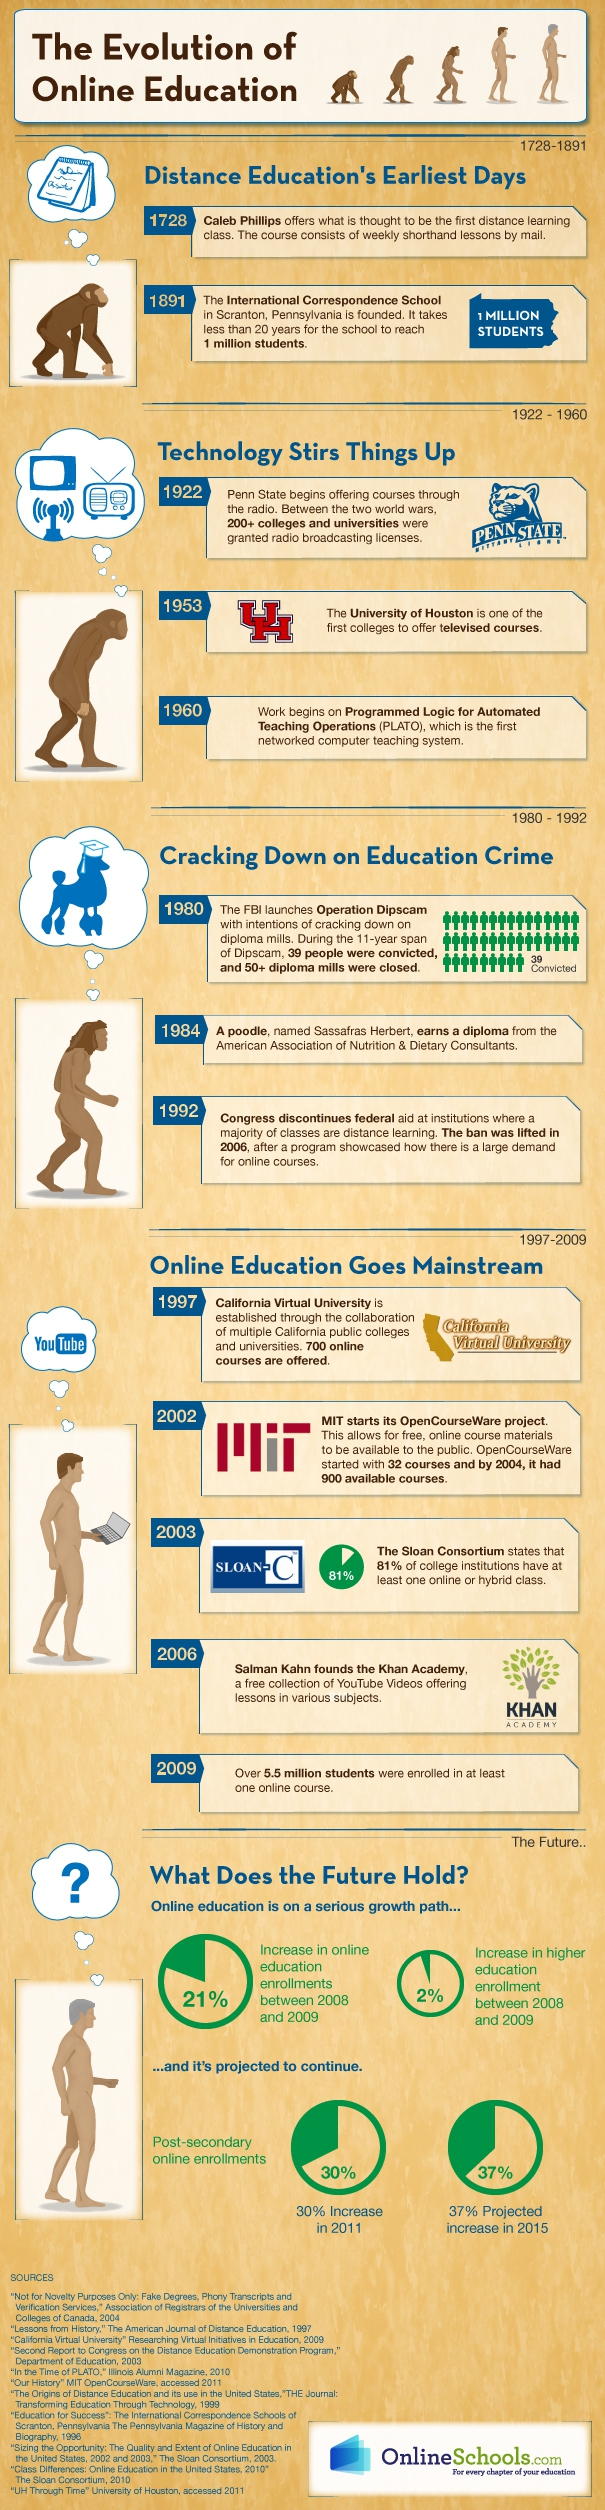 edtech-history